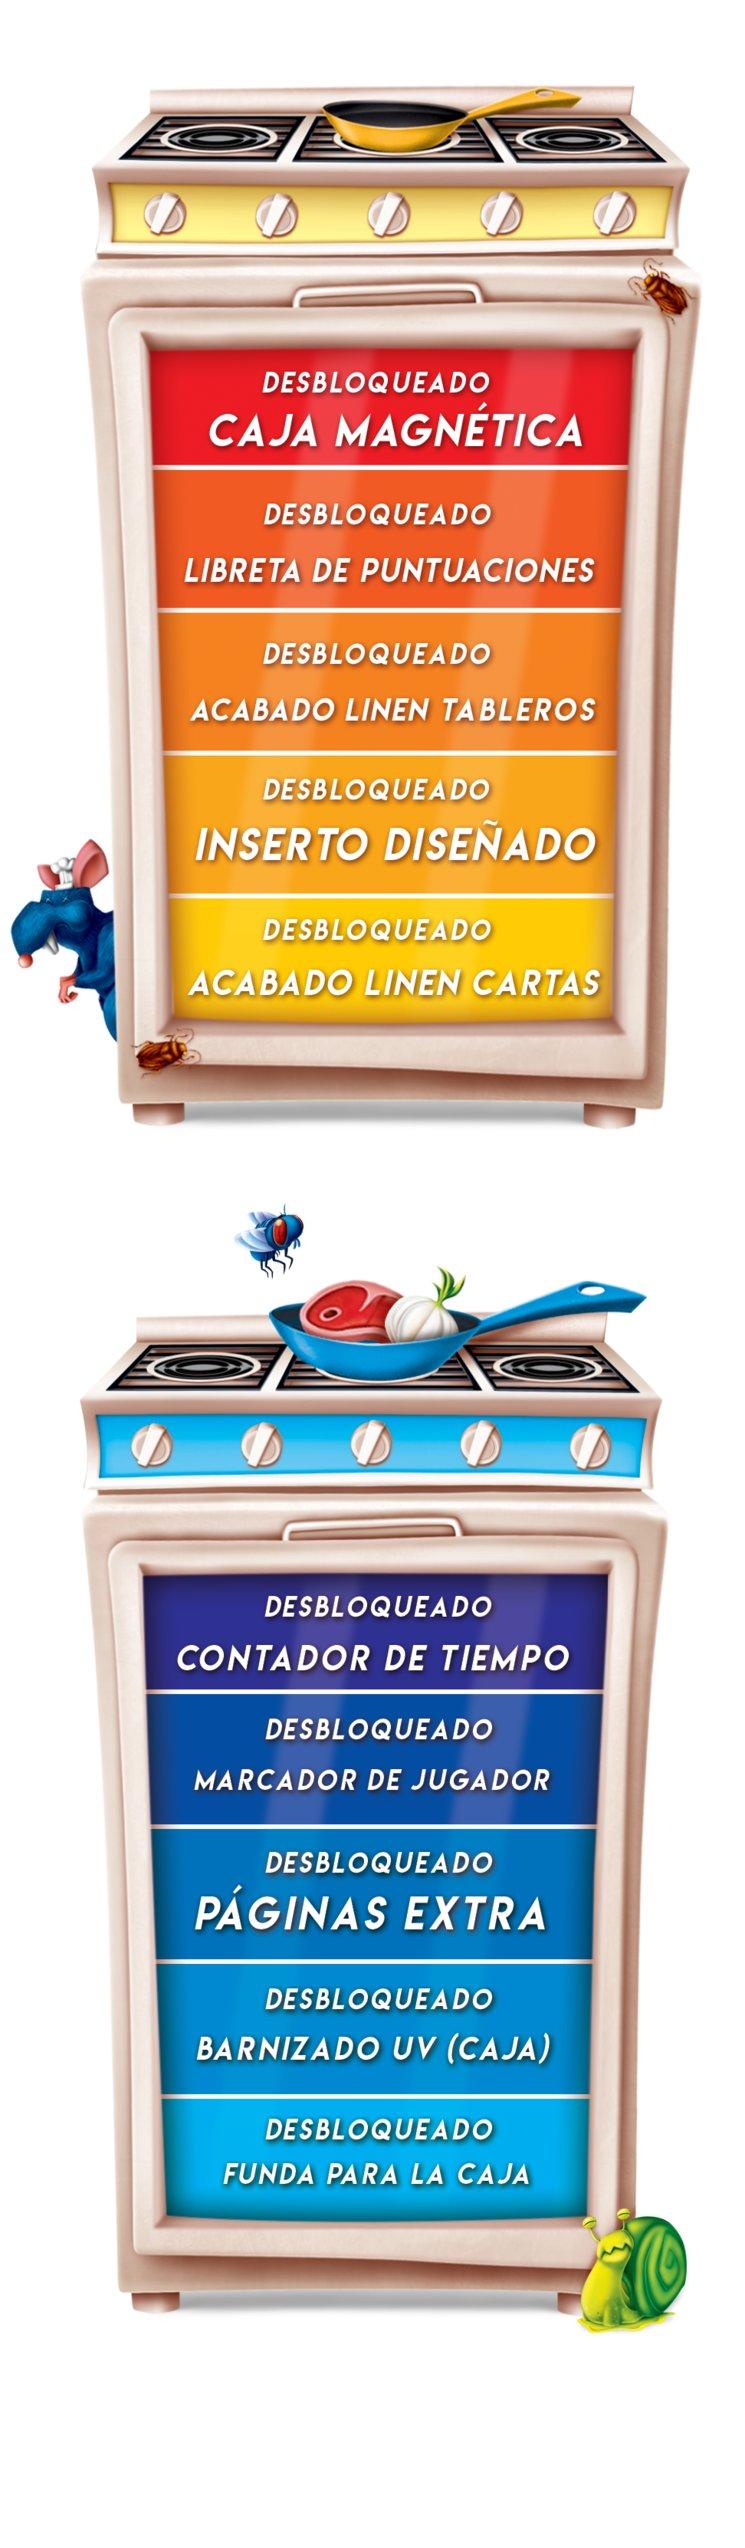 METAS DESBLOQUEADAS